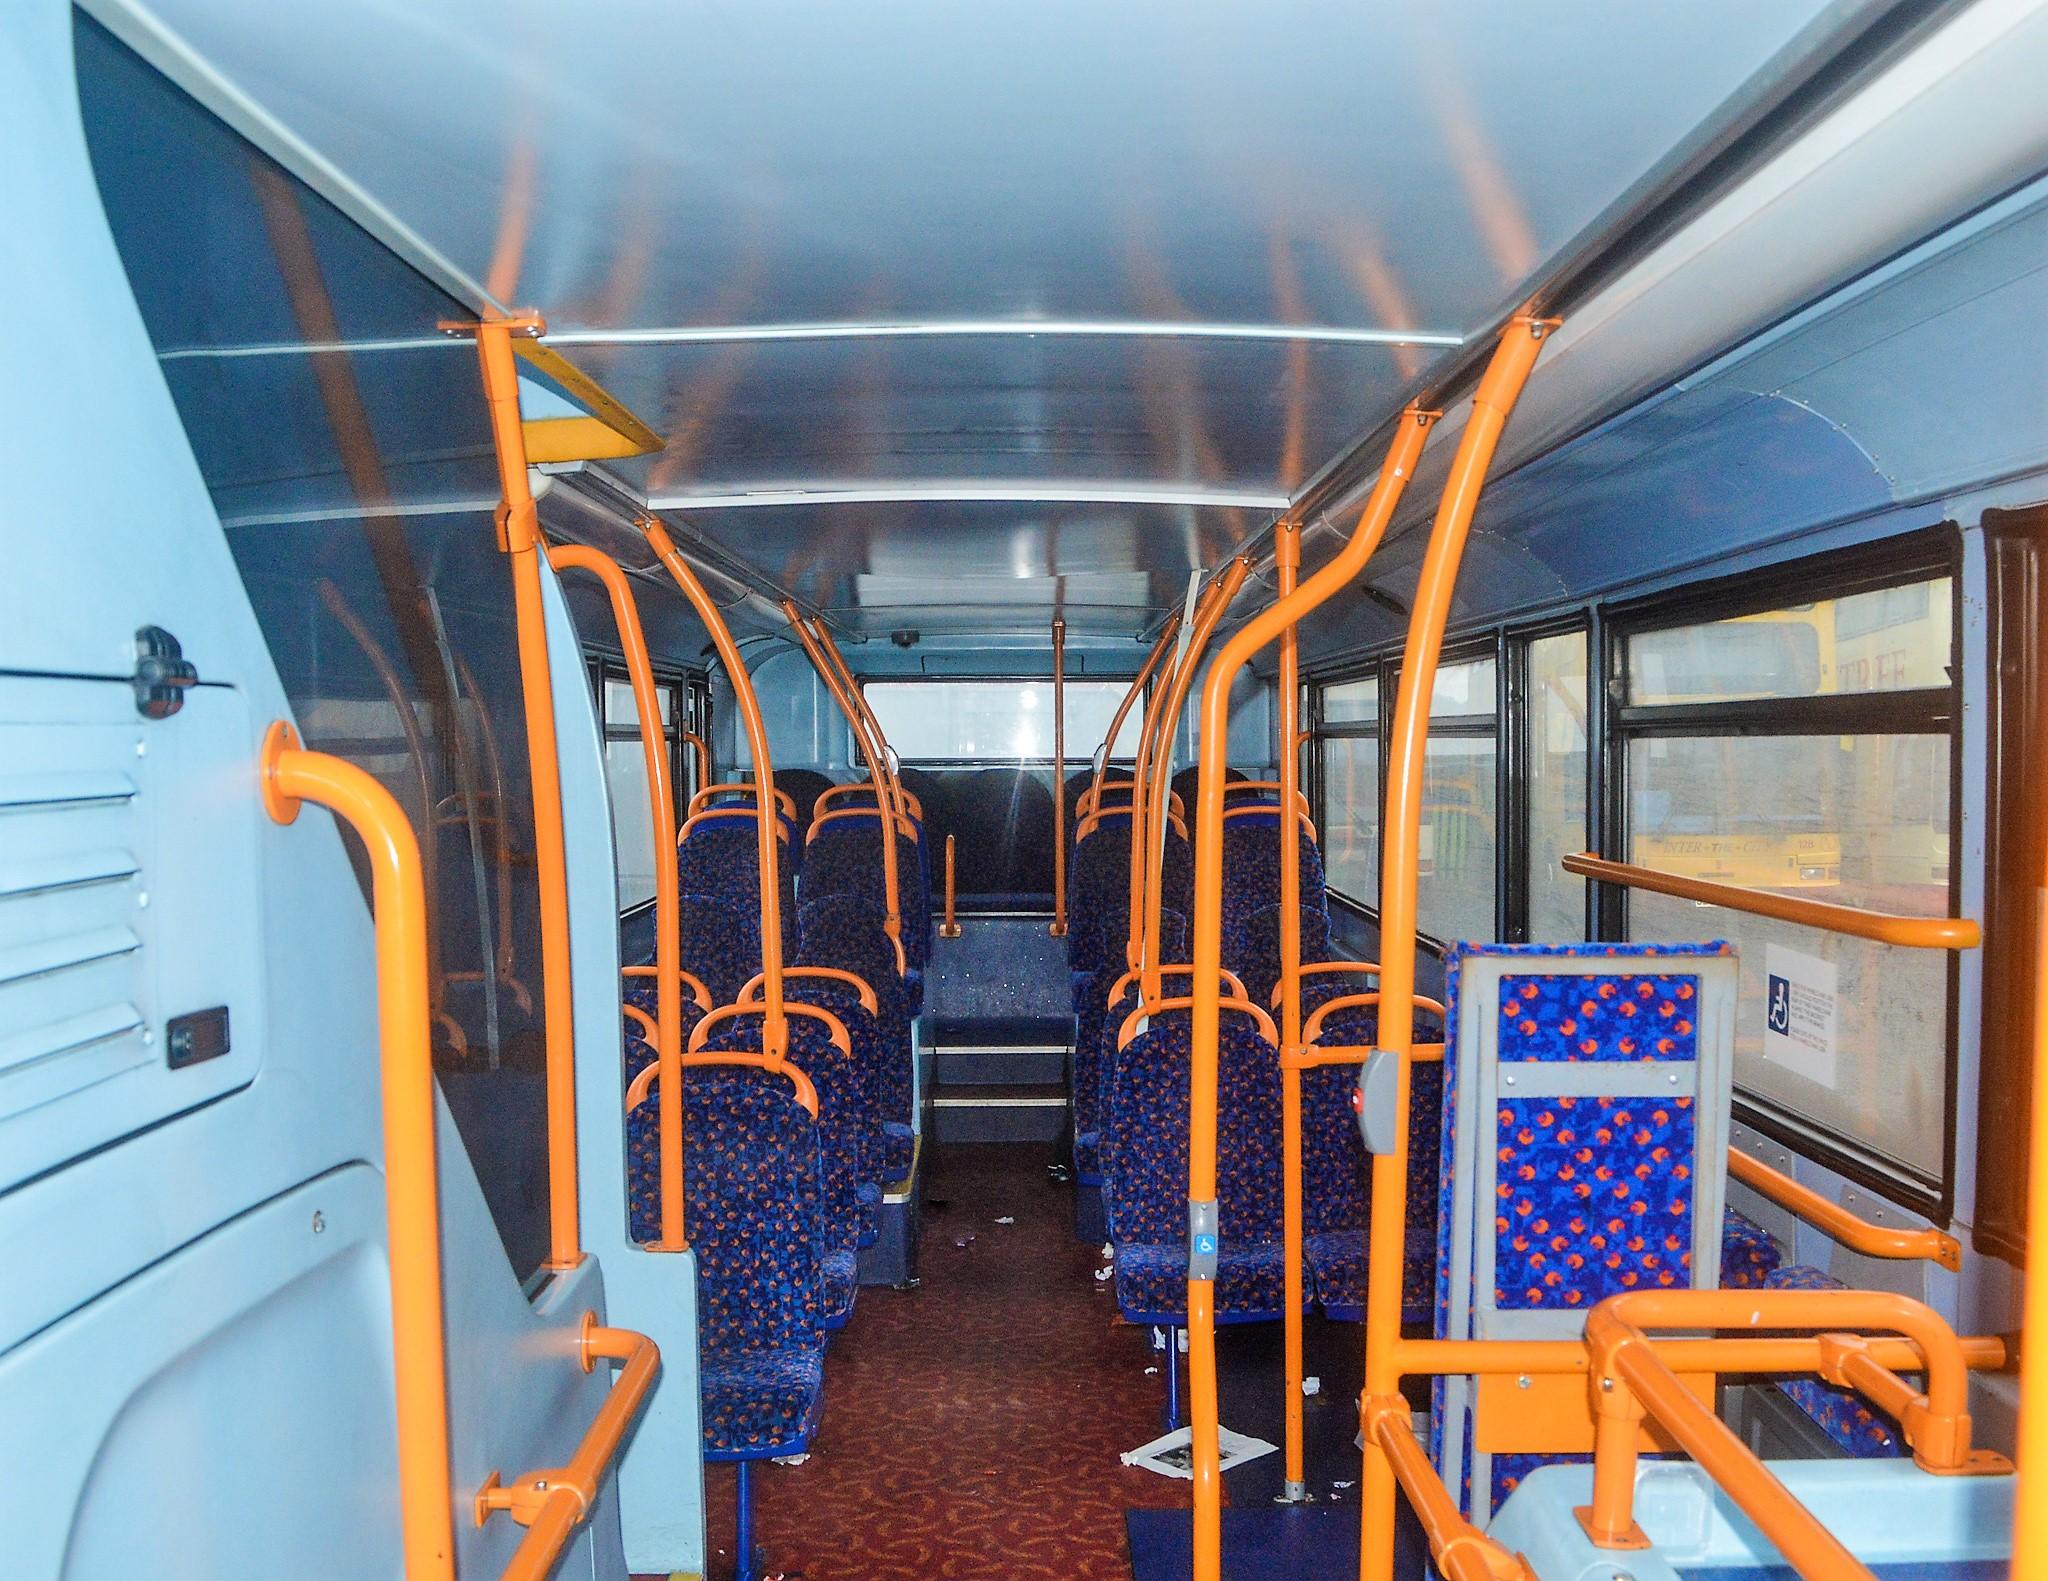 Lot 8 - Alexander Dennis Trident 78 seat double deck service bus Registration Number: LX03 OSG Date of